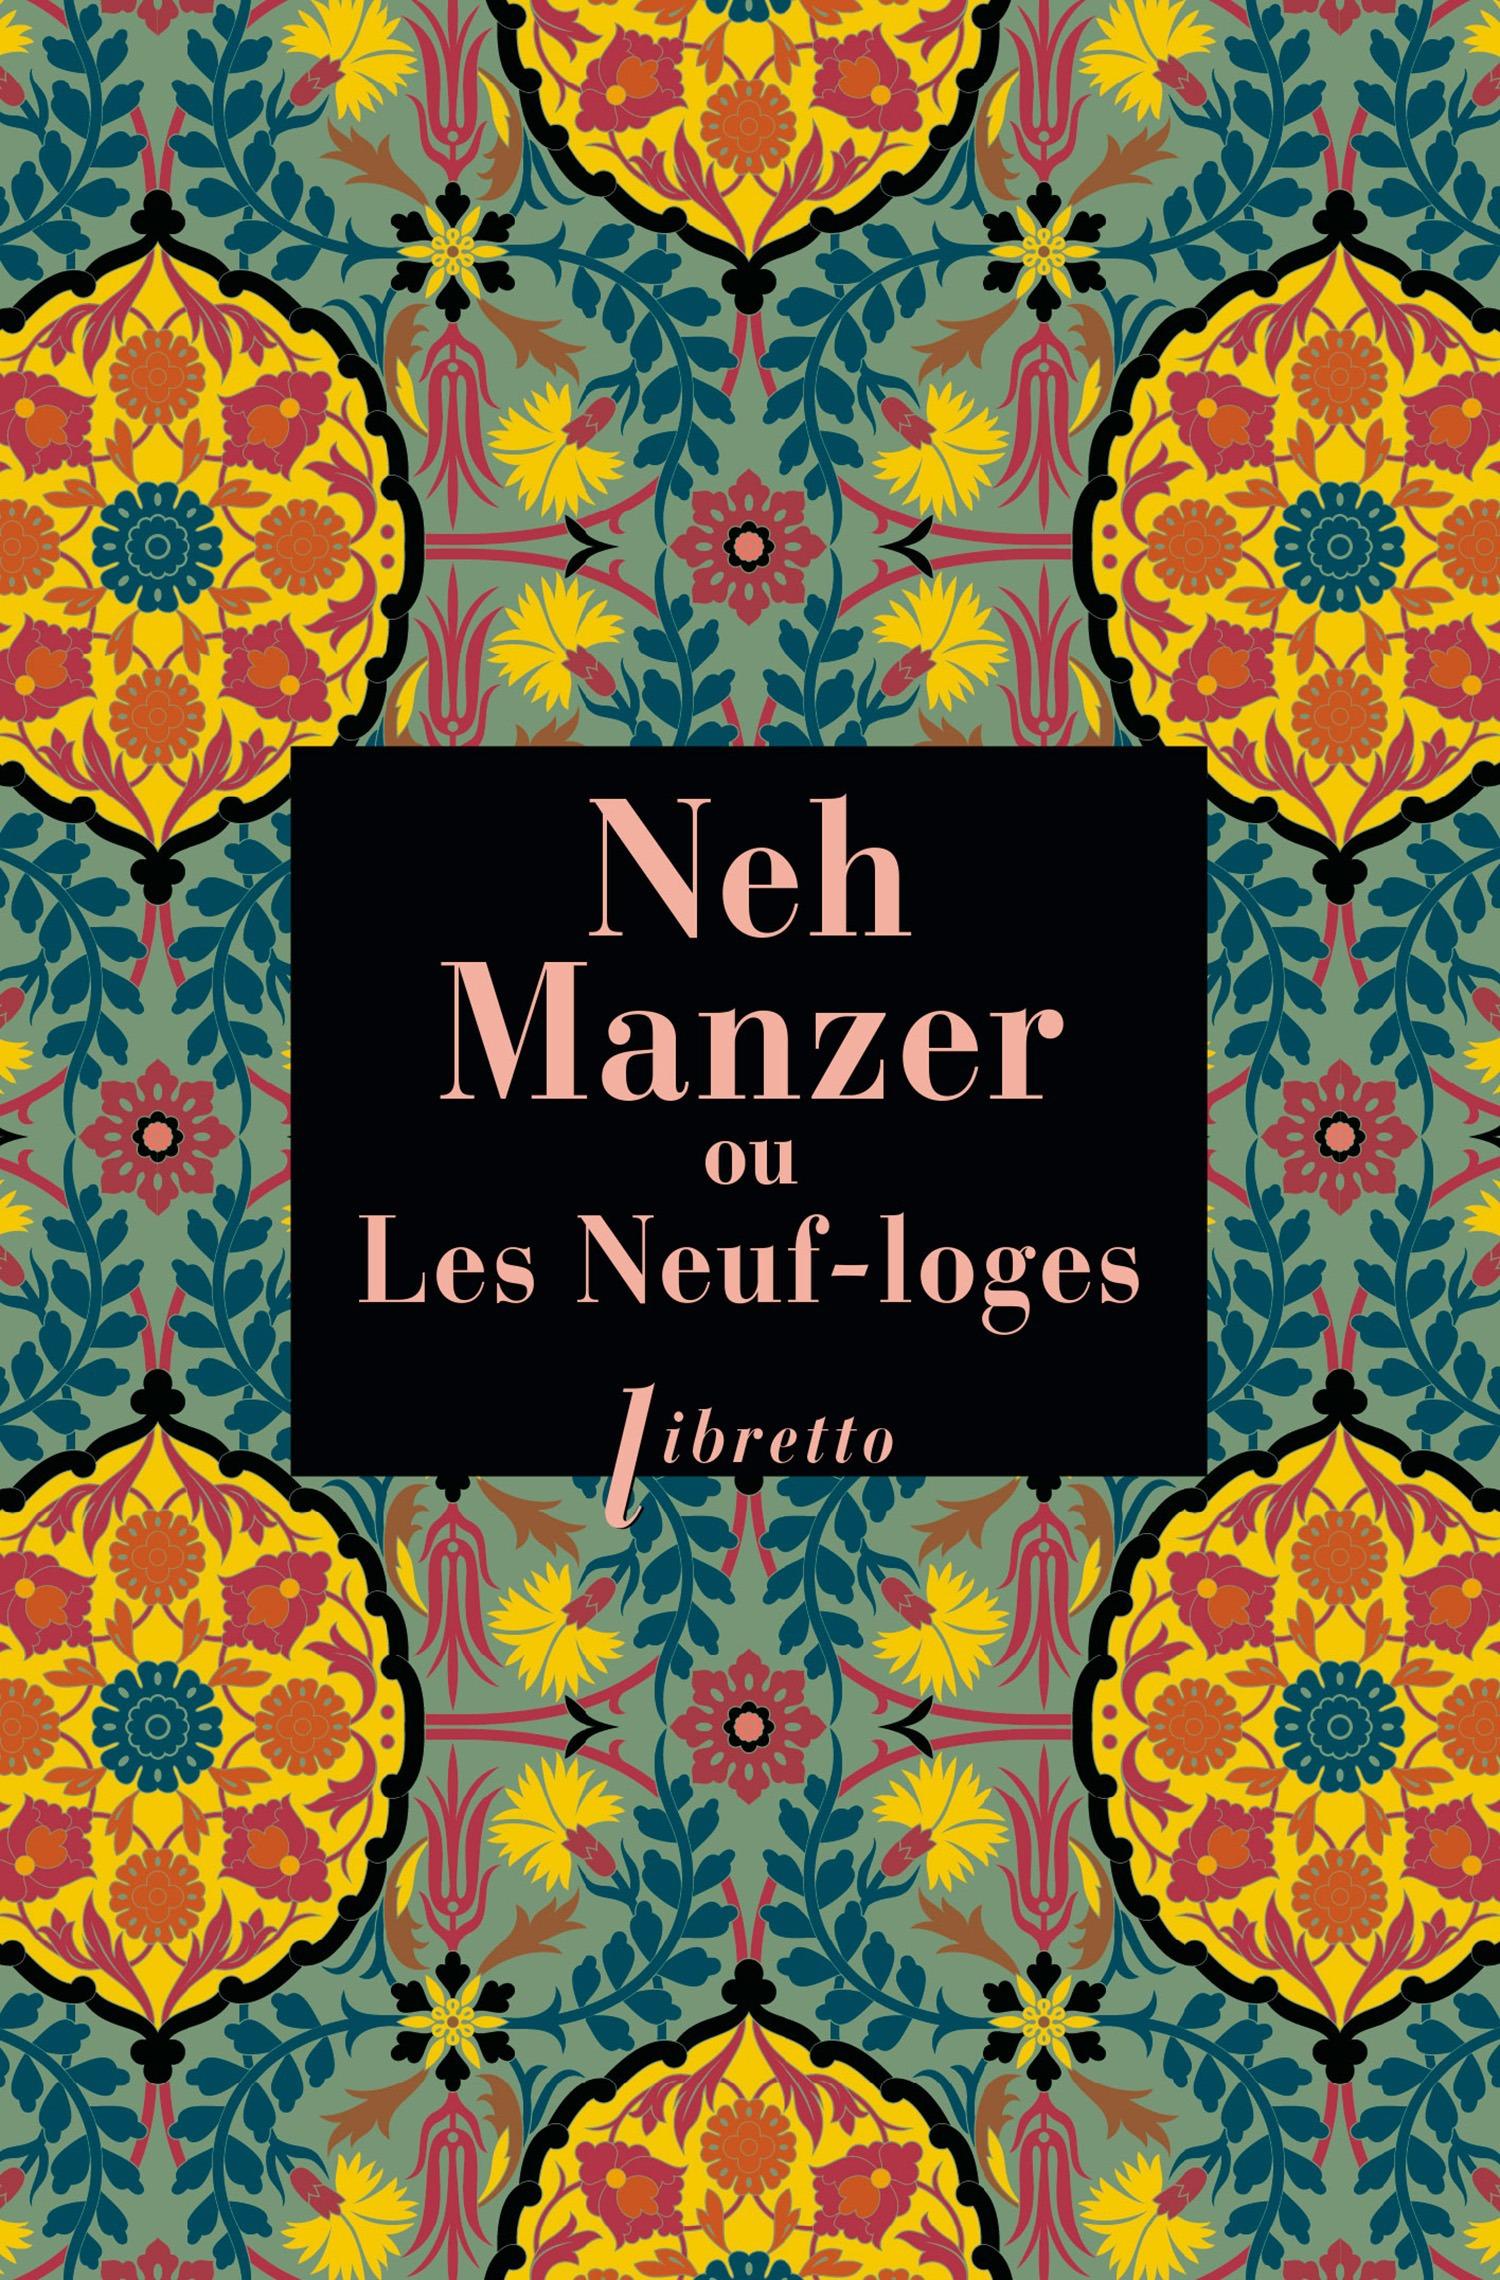 Neh Manzer ou les neuf loges